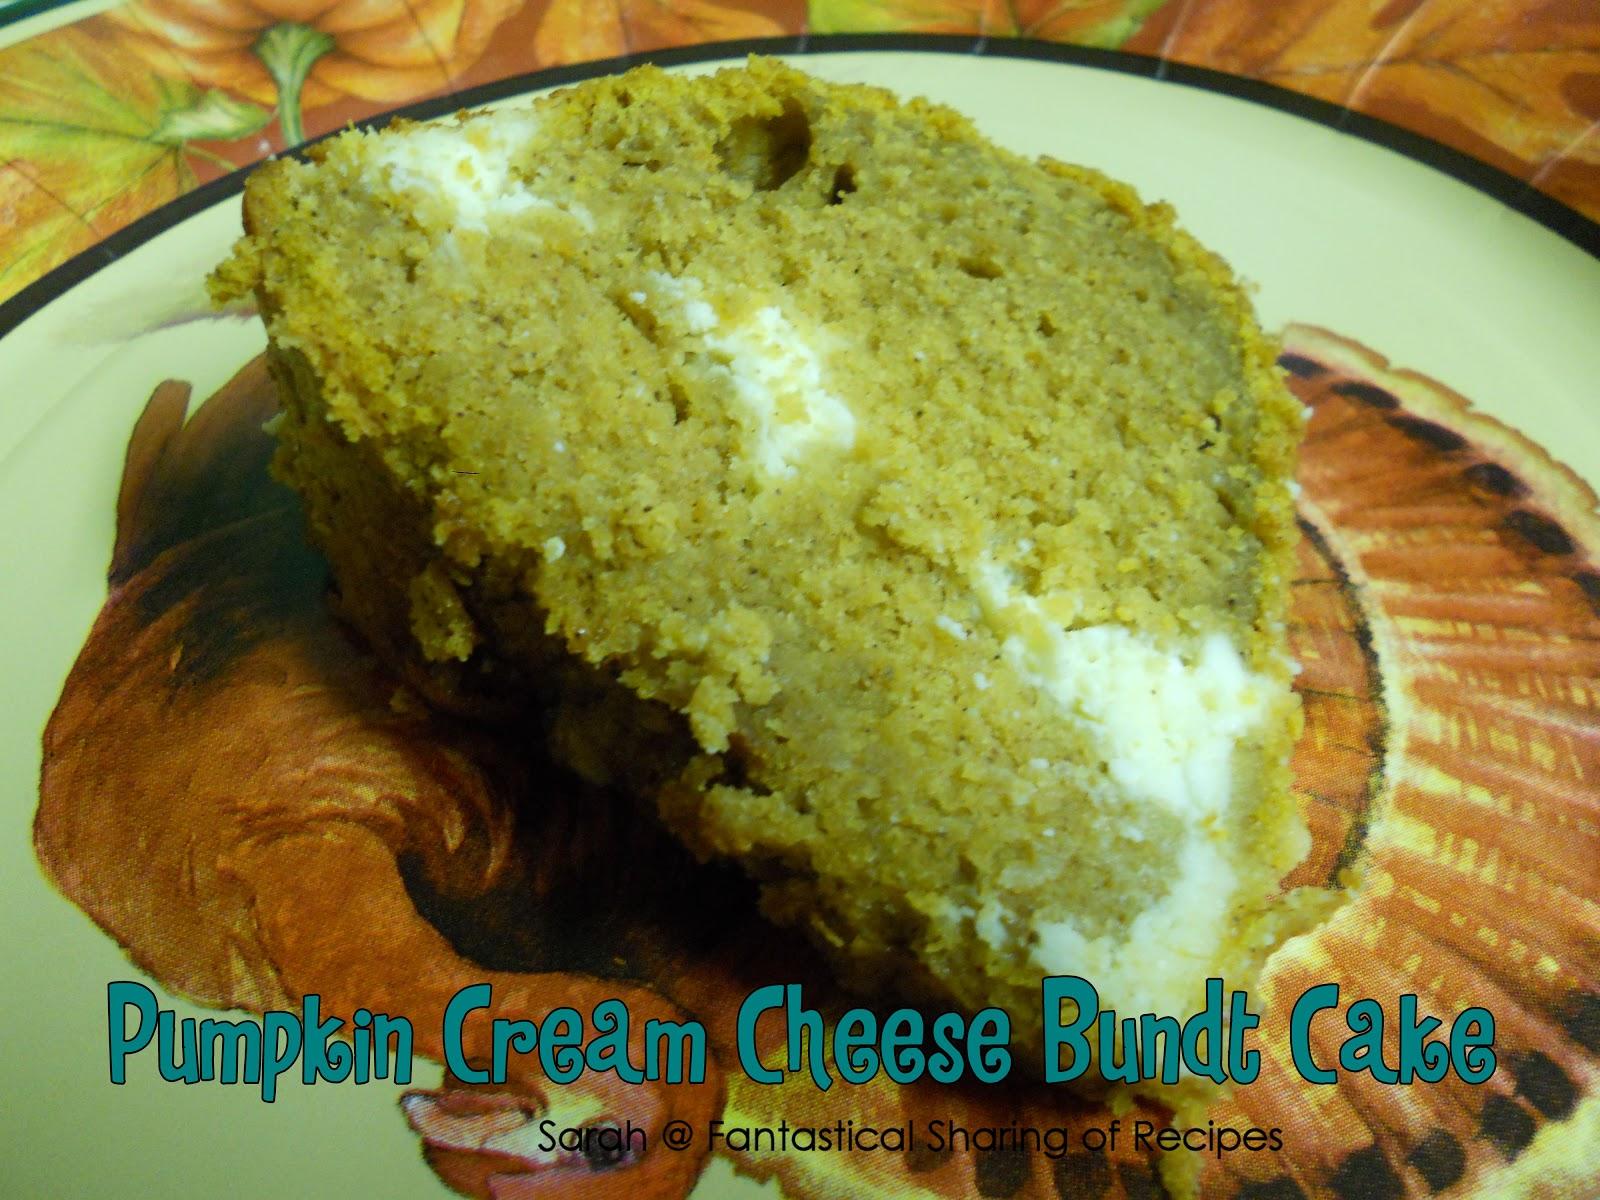 Fantastical Sharing of Recipes: Pumpkin Cream Cheese Bundt ...